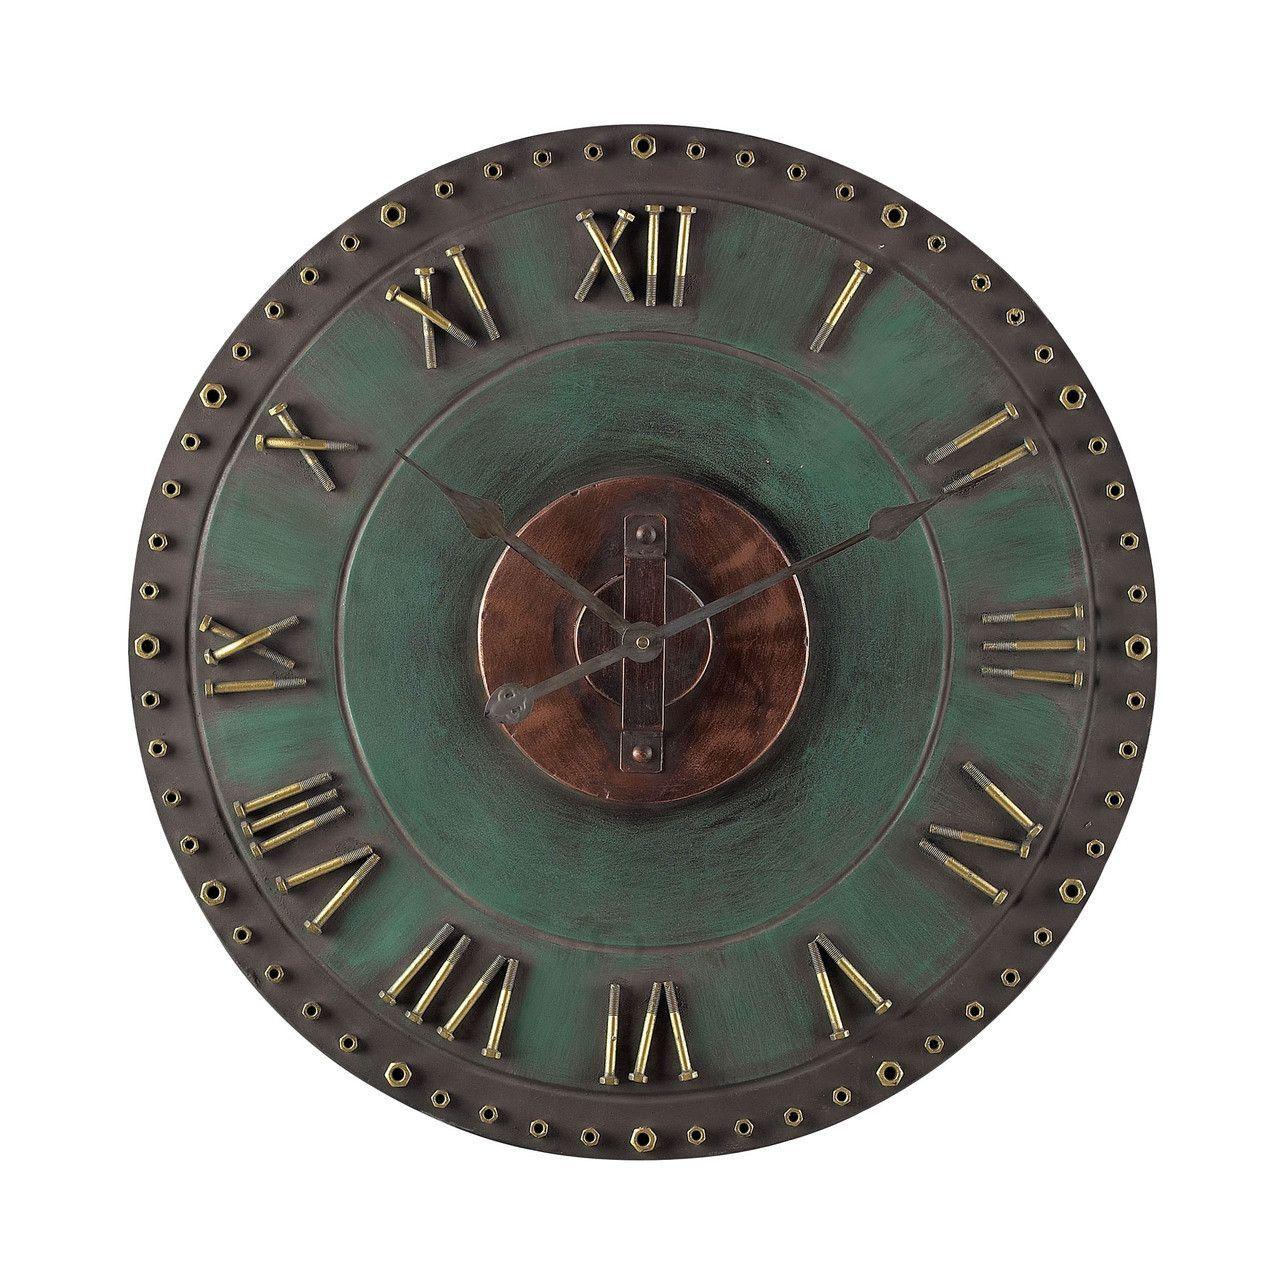 Metal Roman Numeral Outdoor Wall Clock. 128-1004